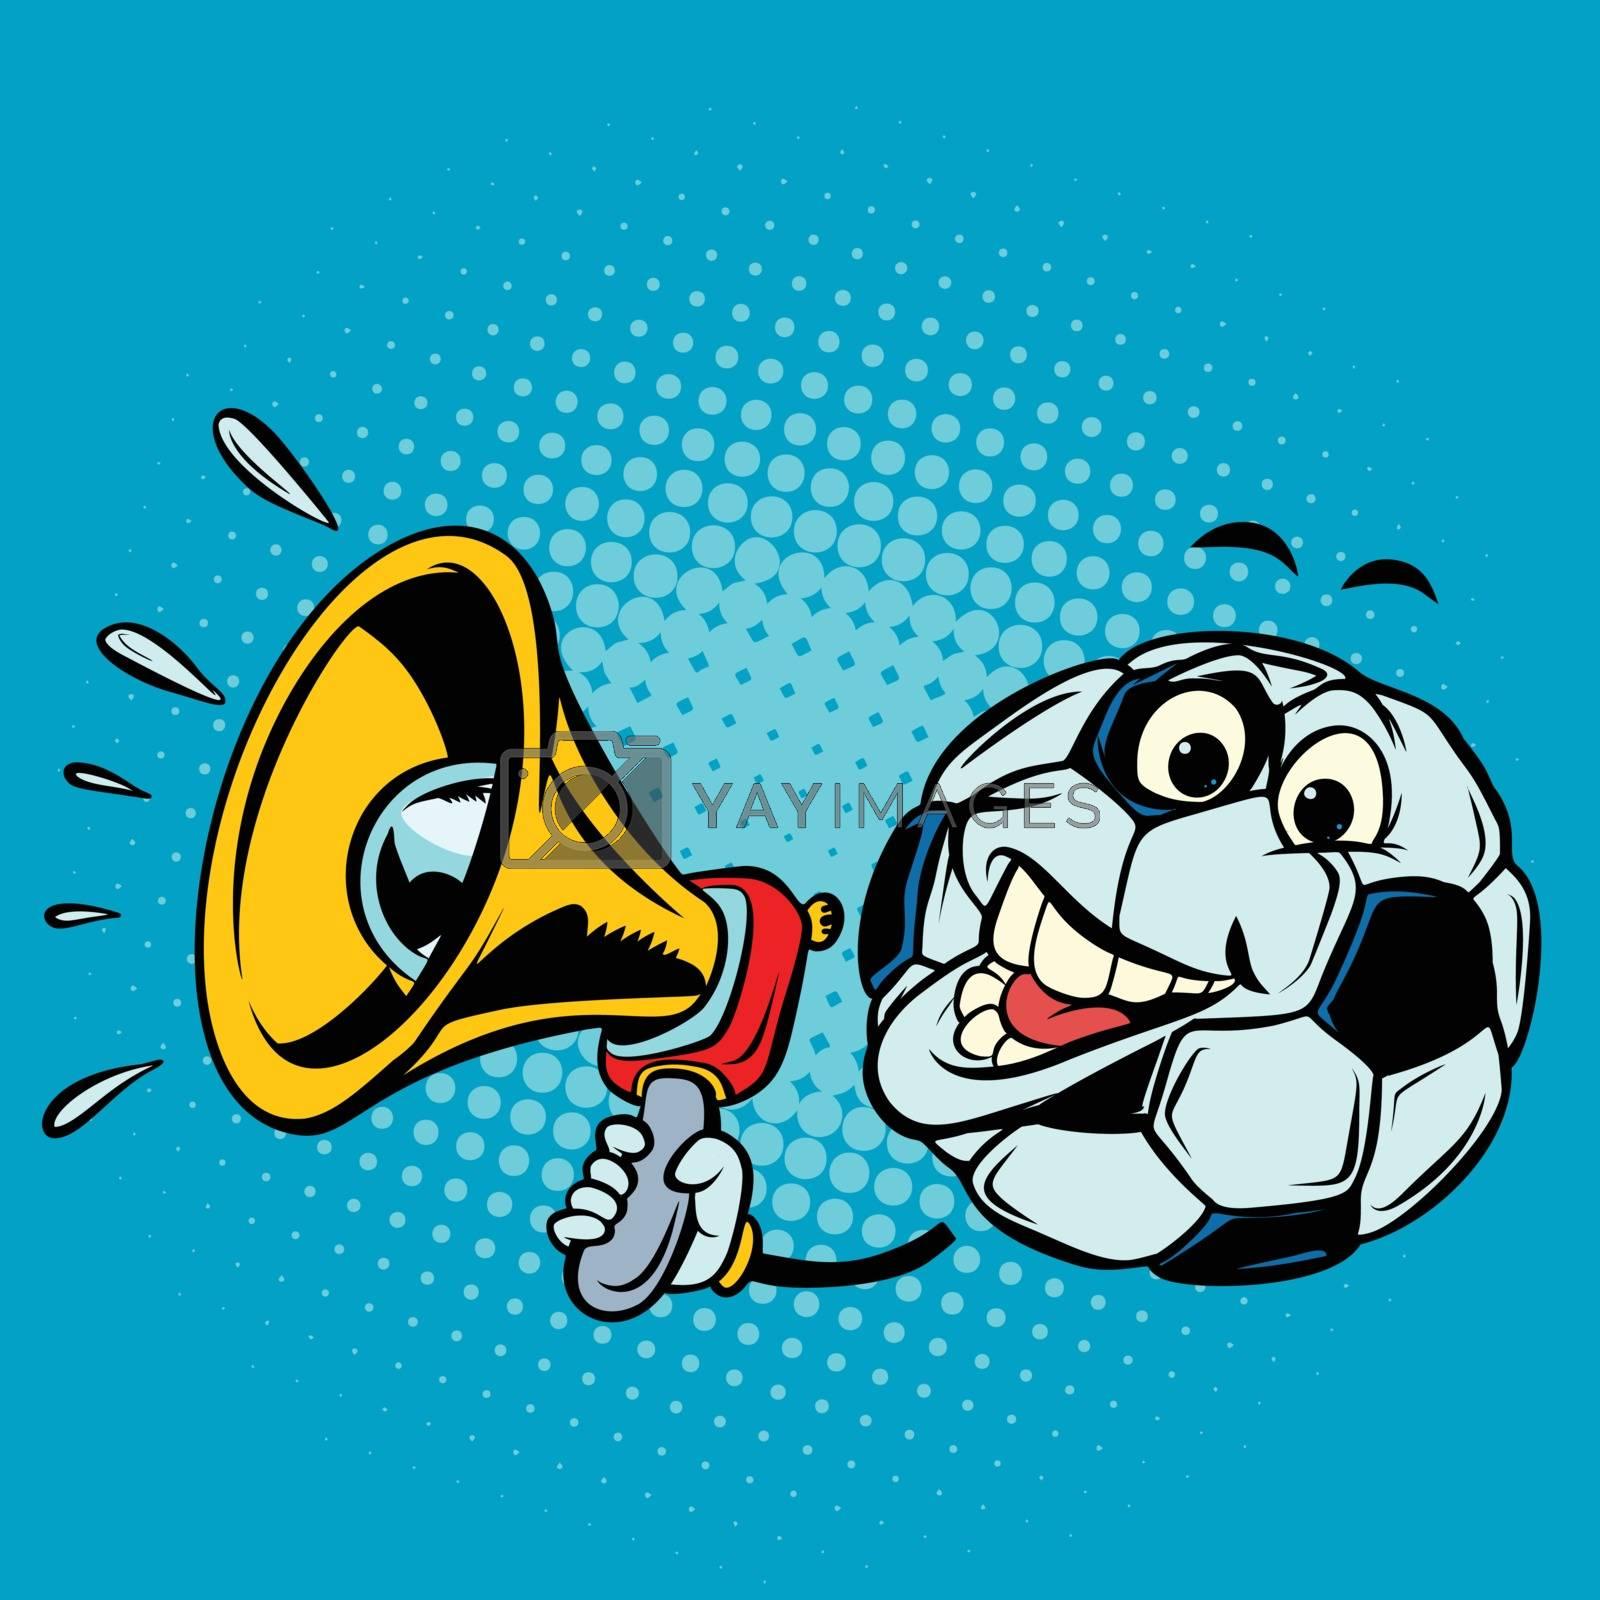 Fan with megaphone. Football soccer ball. Funny character emoticon sticker. Sport world championship competition. Comic cartoon pop art retro vector illustration